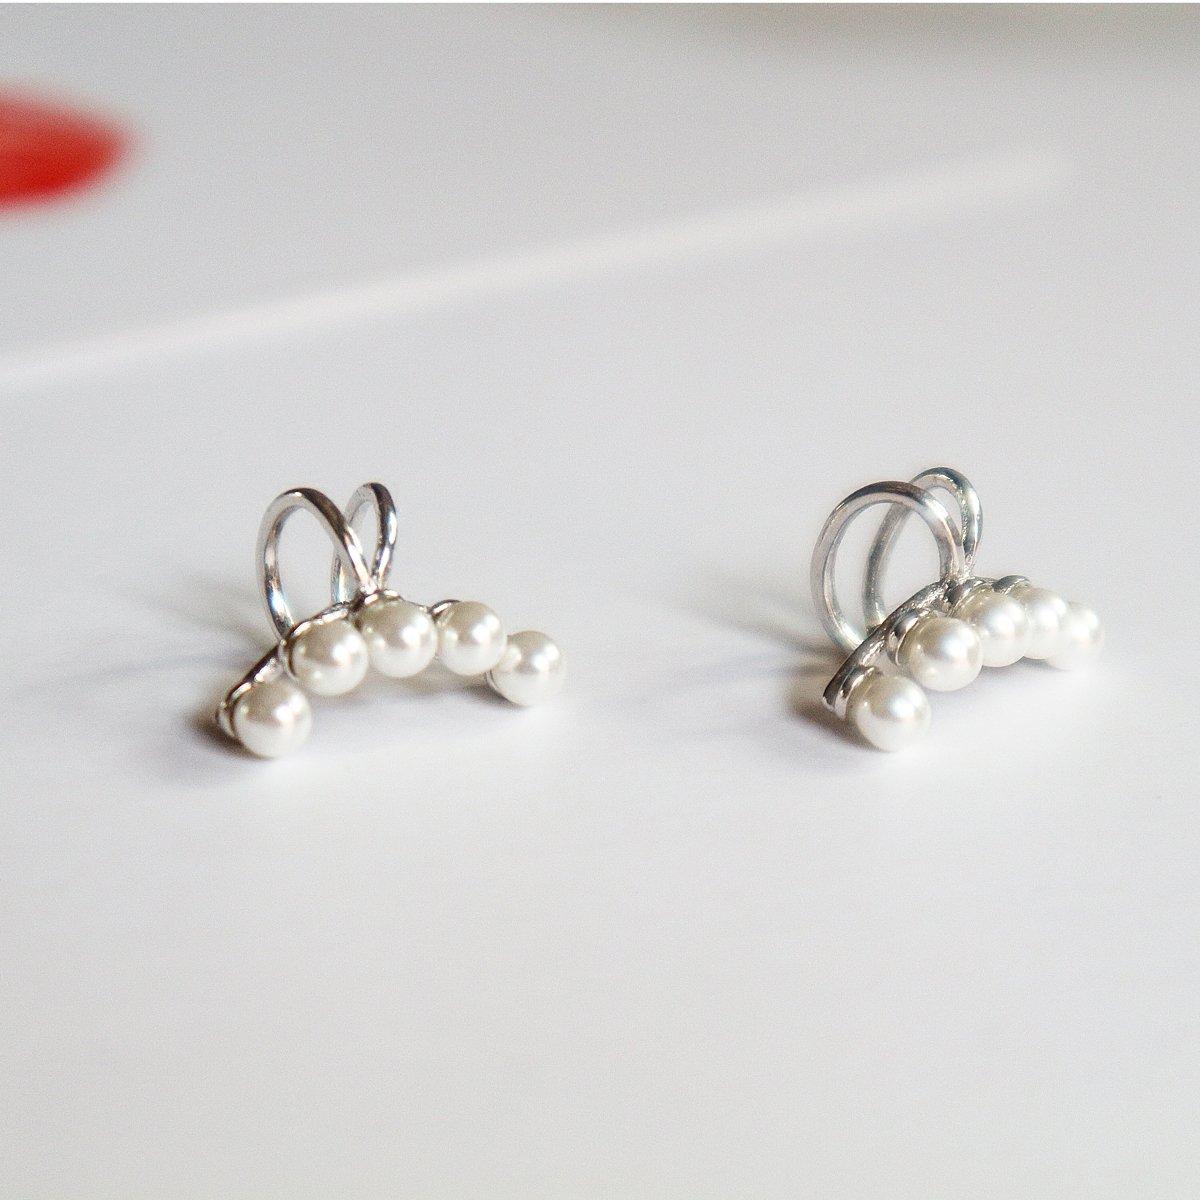 Aifeer Sterling Silver Non Pierced Ear Stud Earrings 5 Pearls Wrap Cuff Clip On Ear Clamp (A Pair) by Aifeer (Image #6)